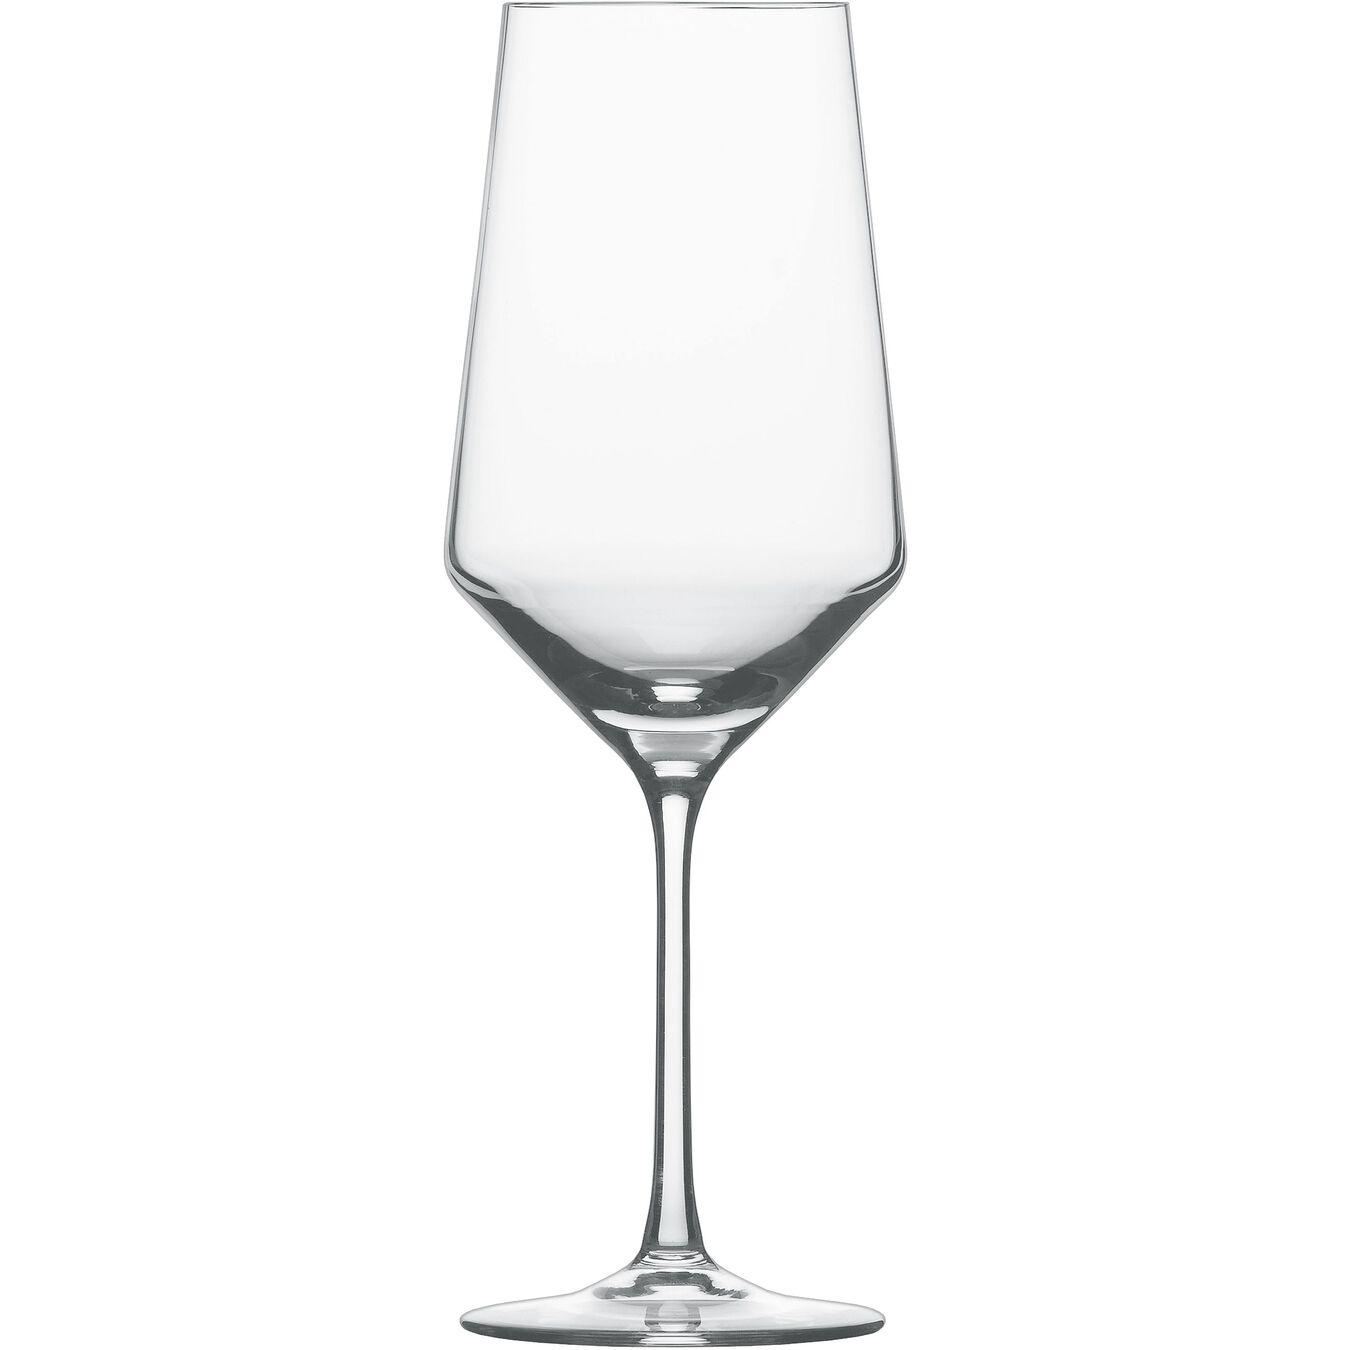 Taça para vinho tinto 680 ml,,large 1